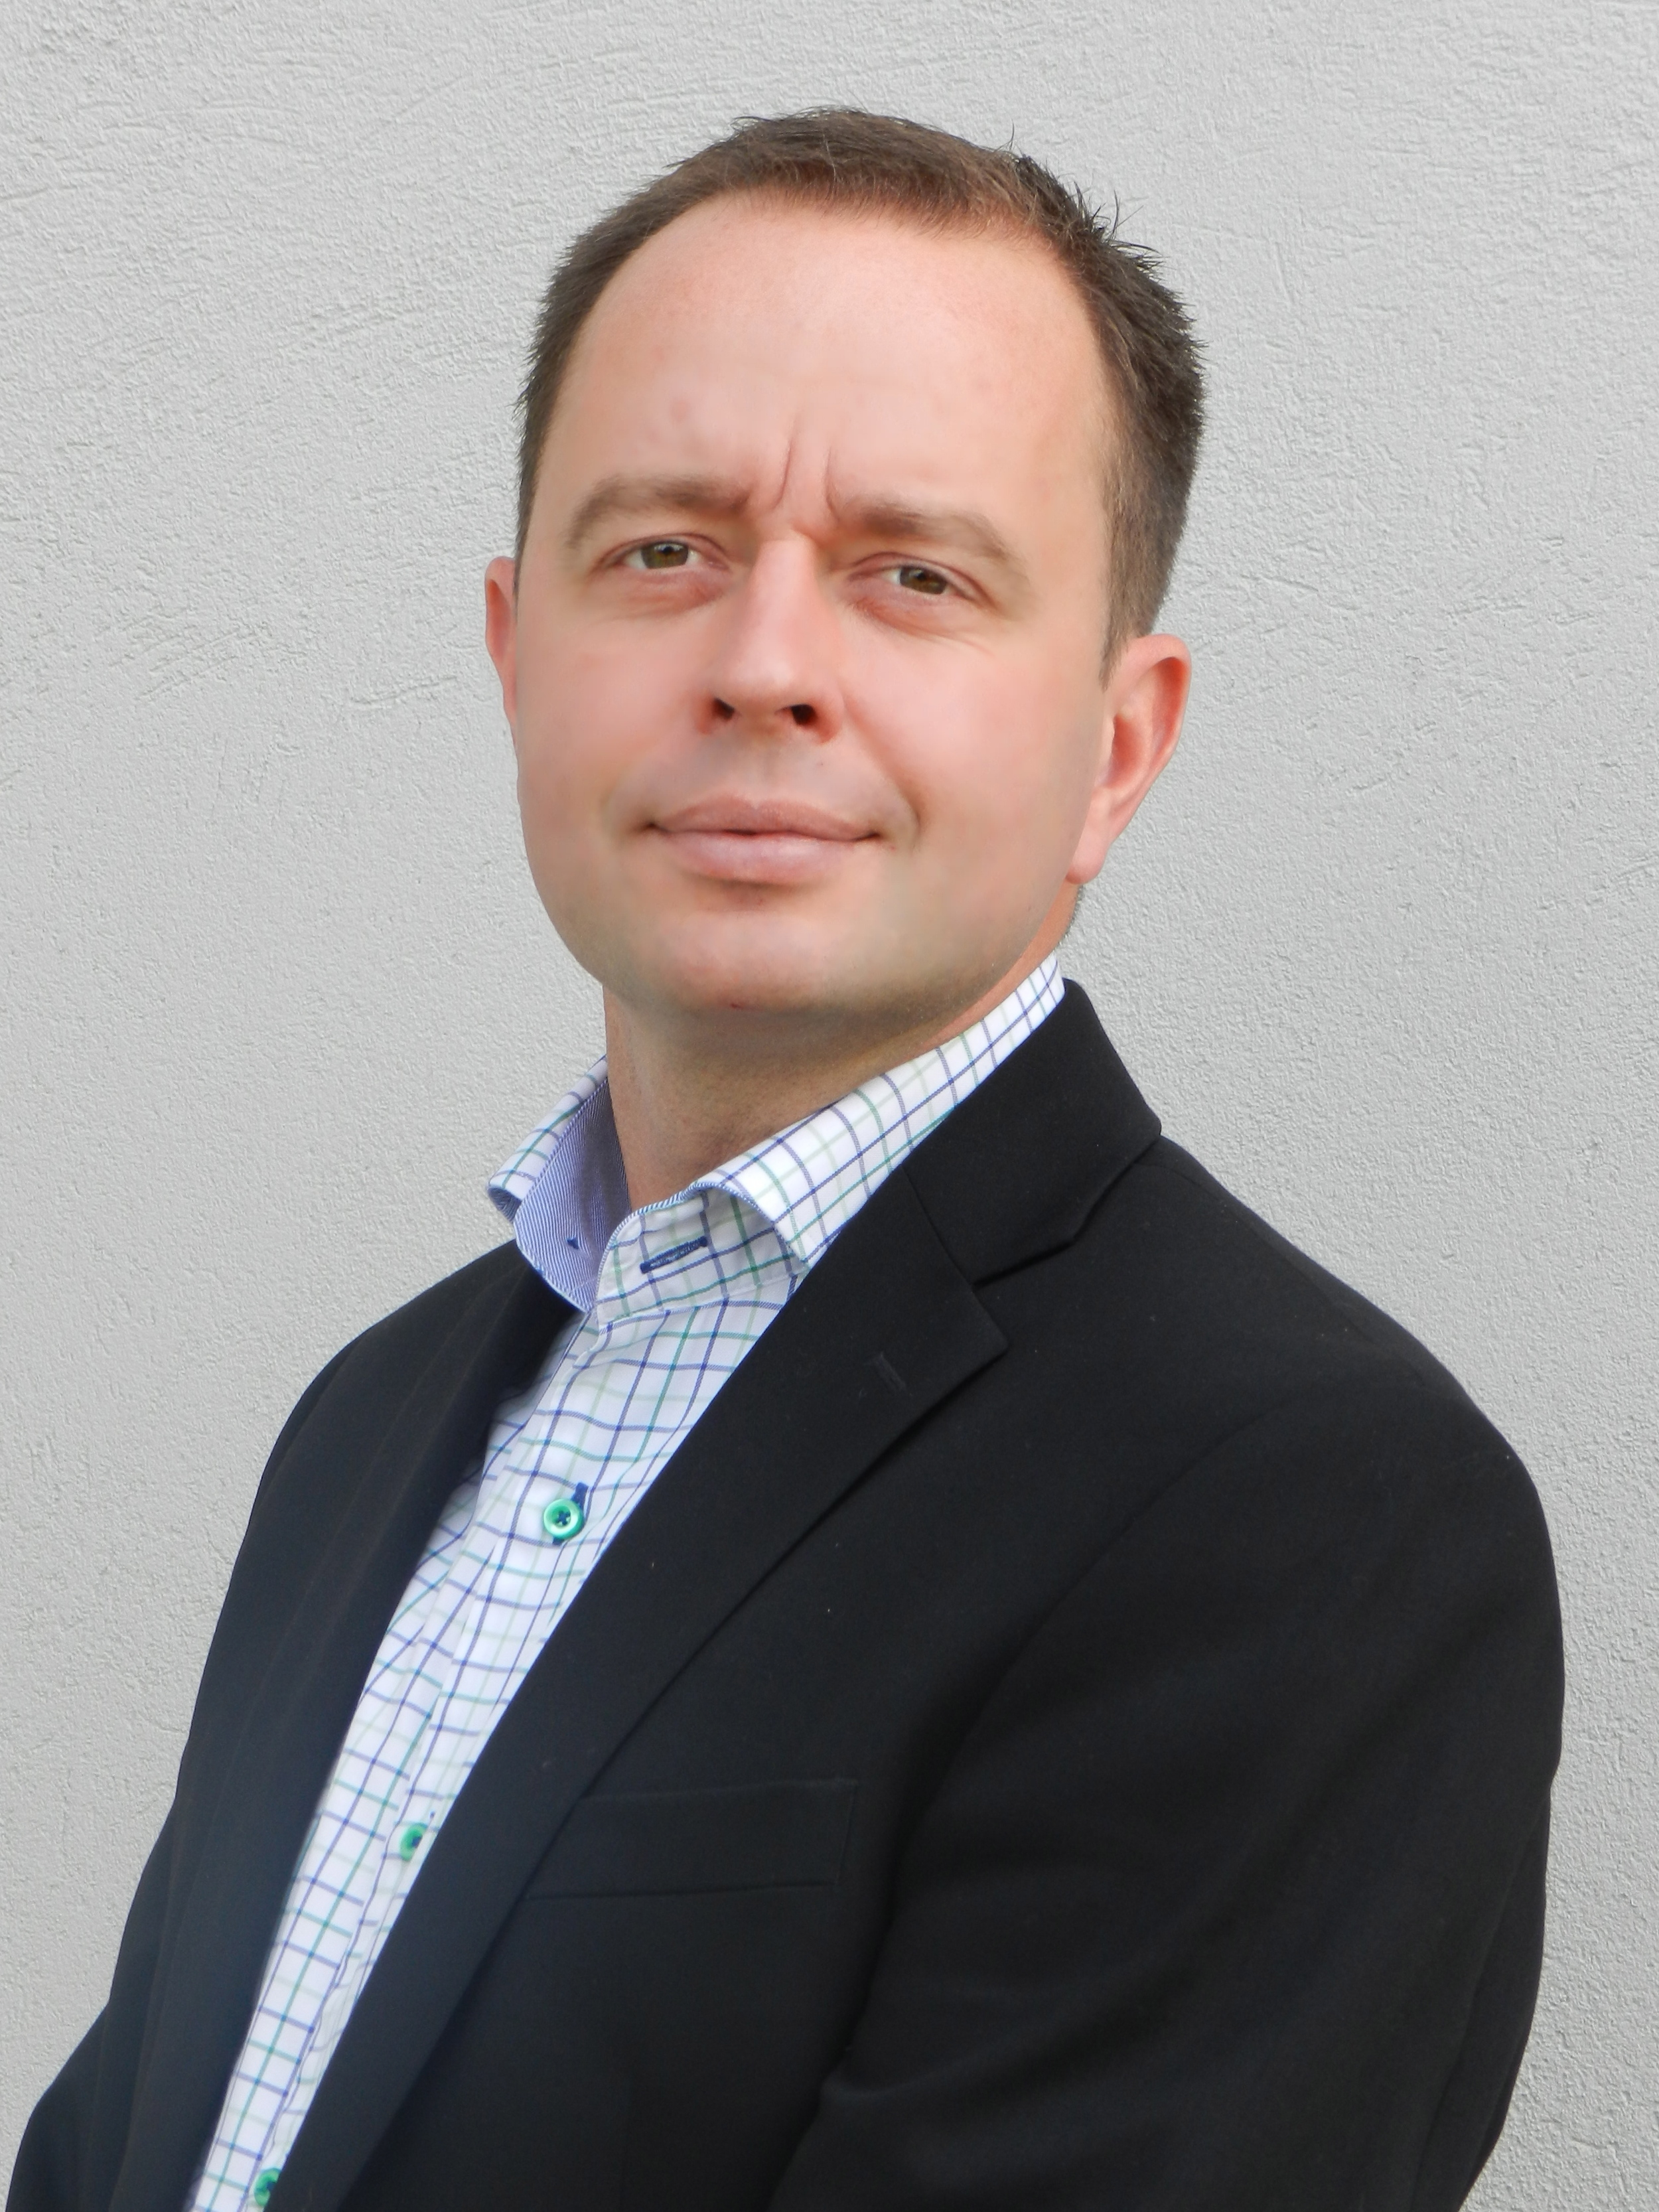 Mattias Jerreström